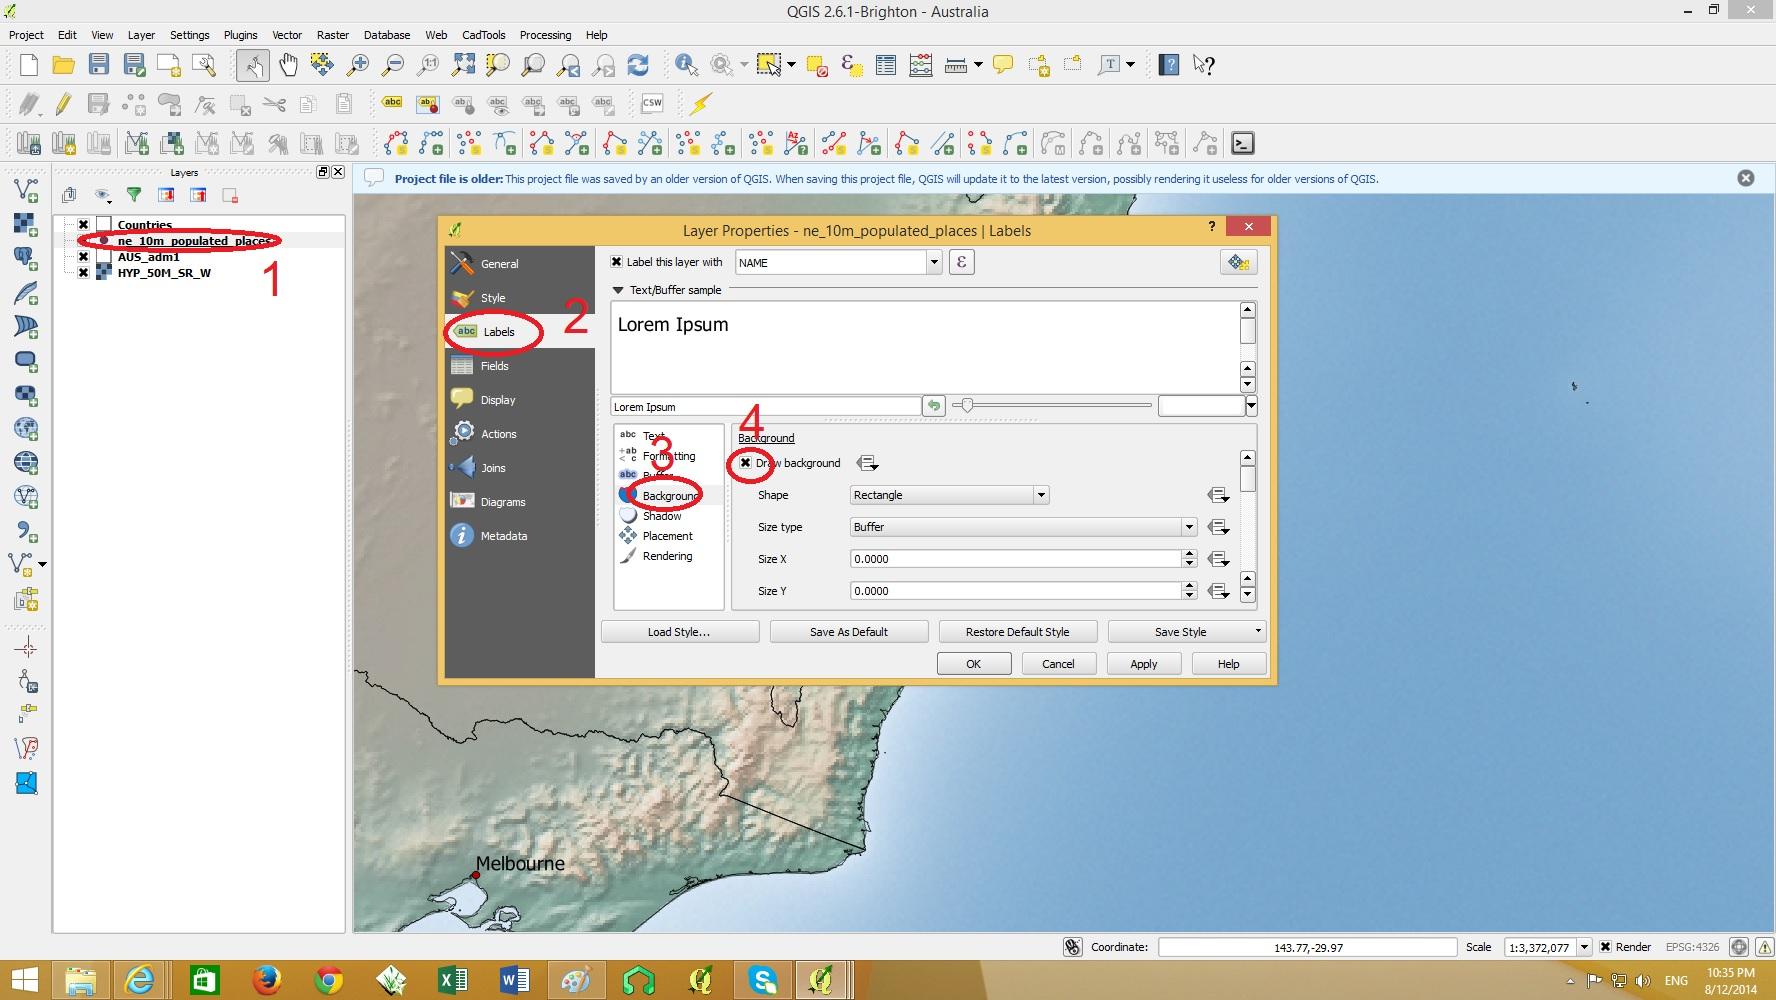 GIS MAP DESIGN USING QGIS